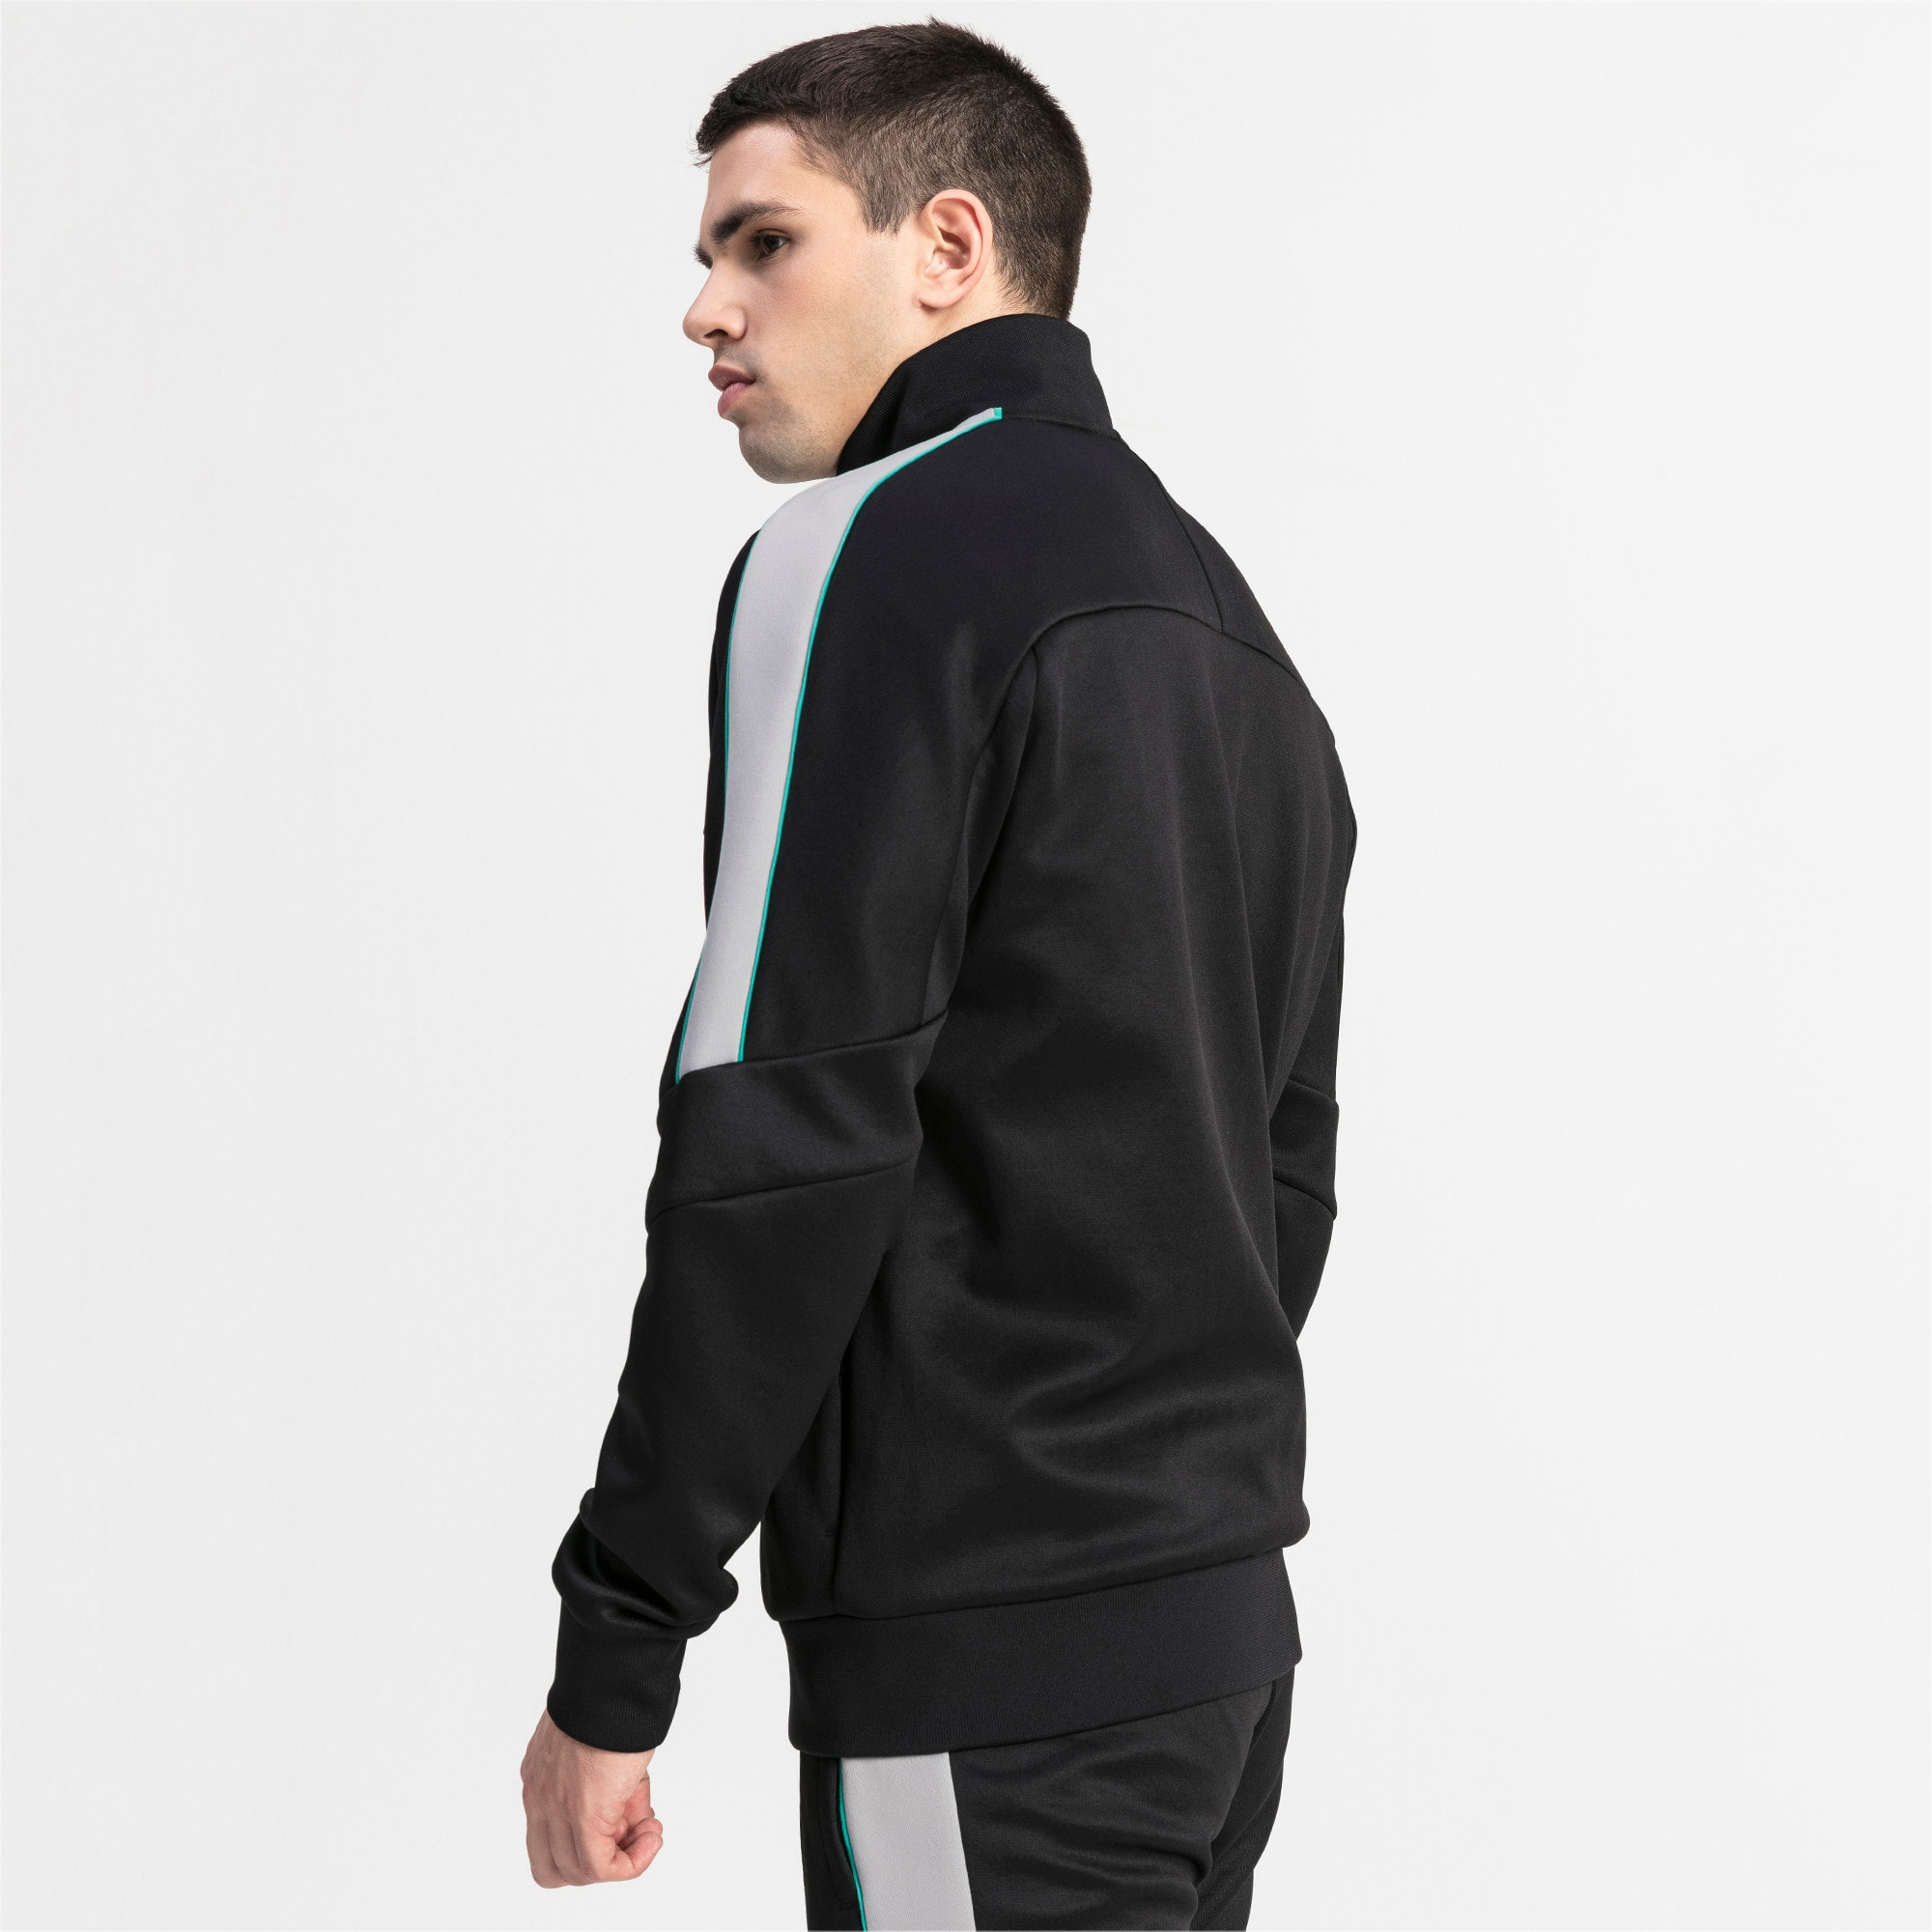 Thumbnail 2 of MAPM T7 Men's Track Jacket, Puma Black, medium